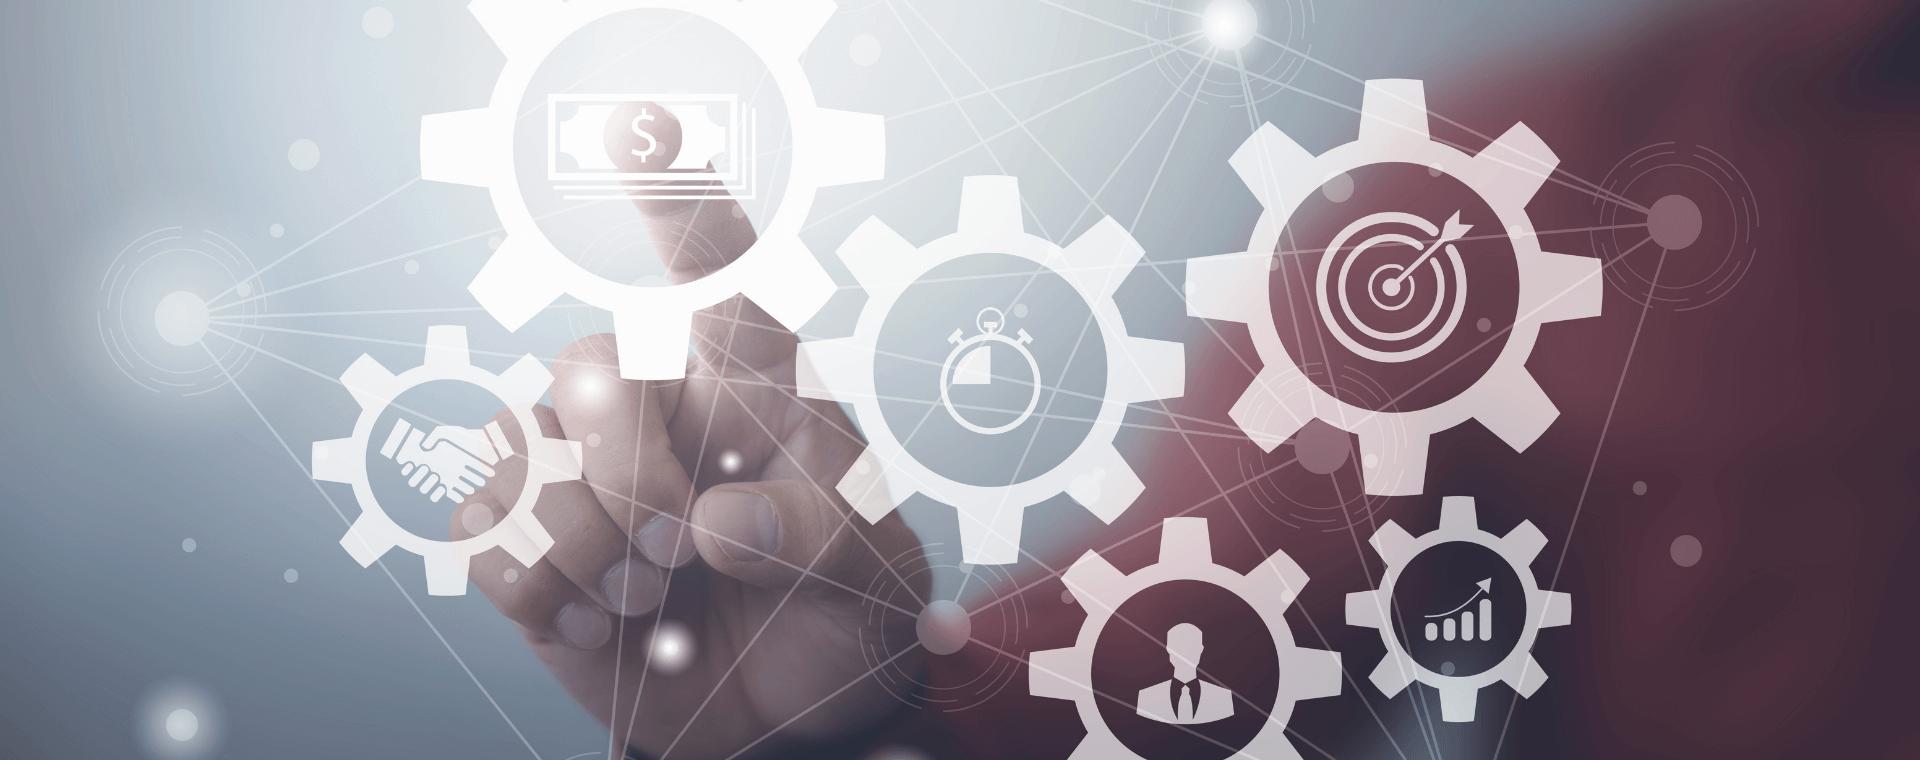 managing e-transformation project